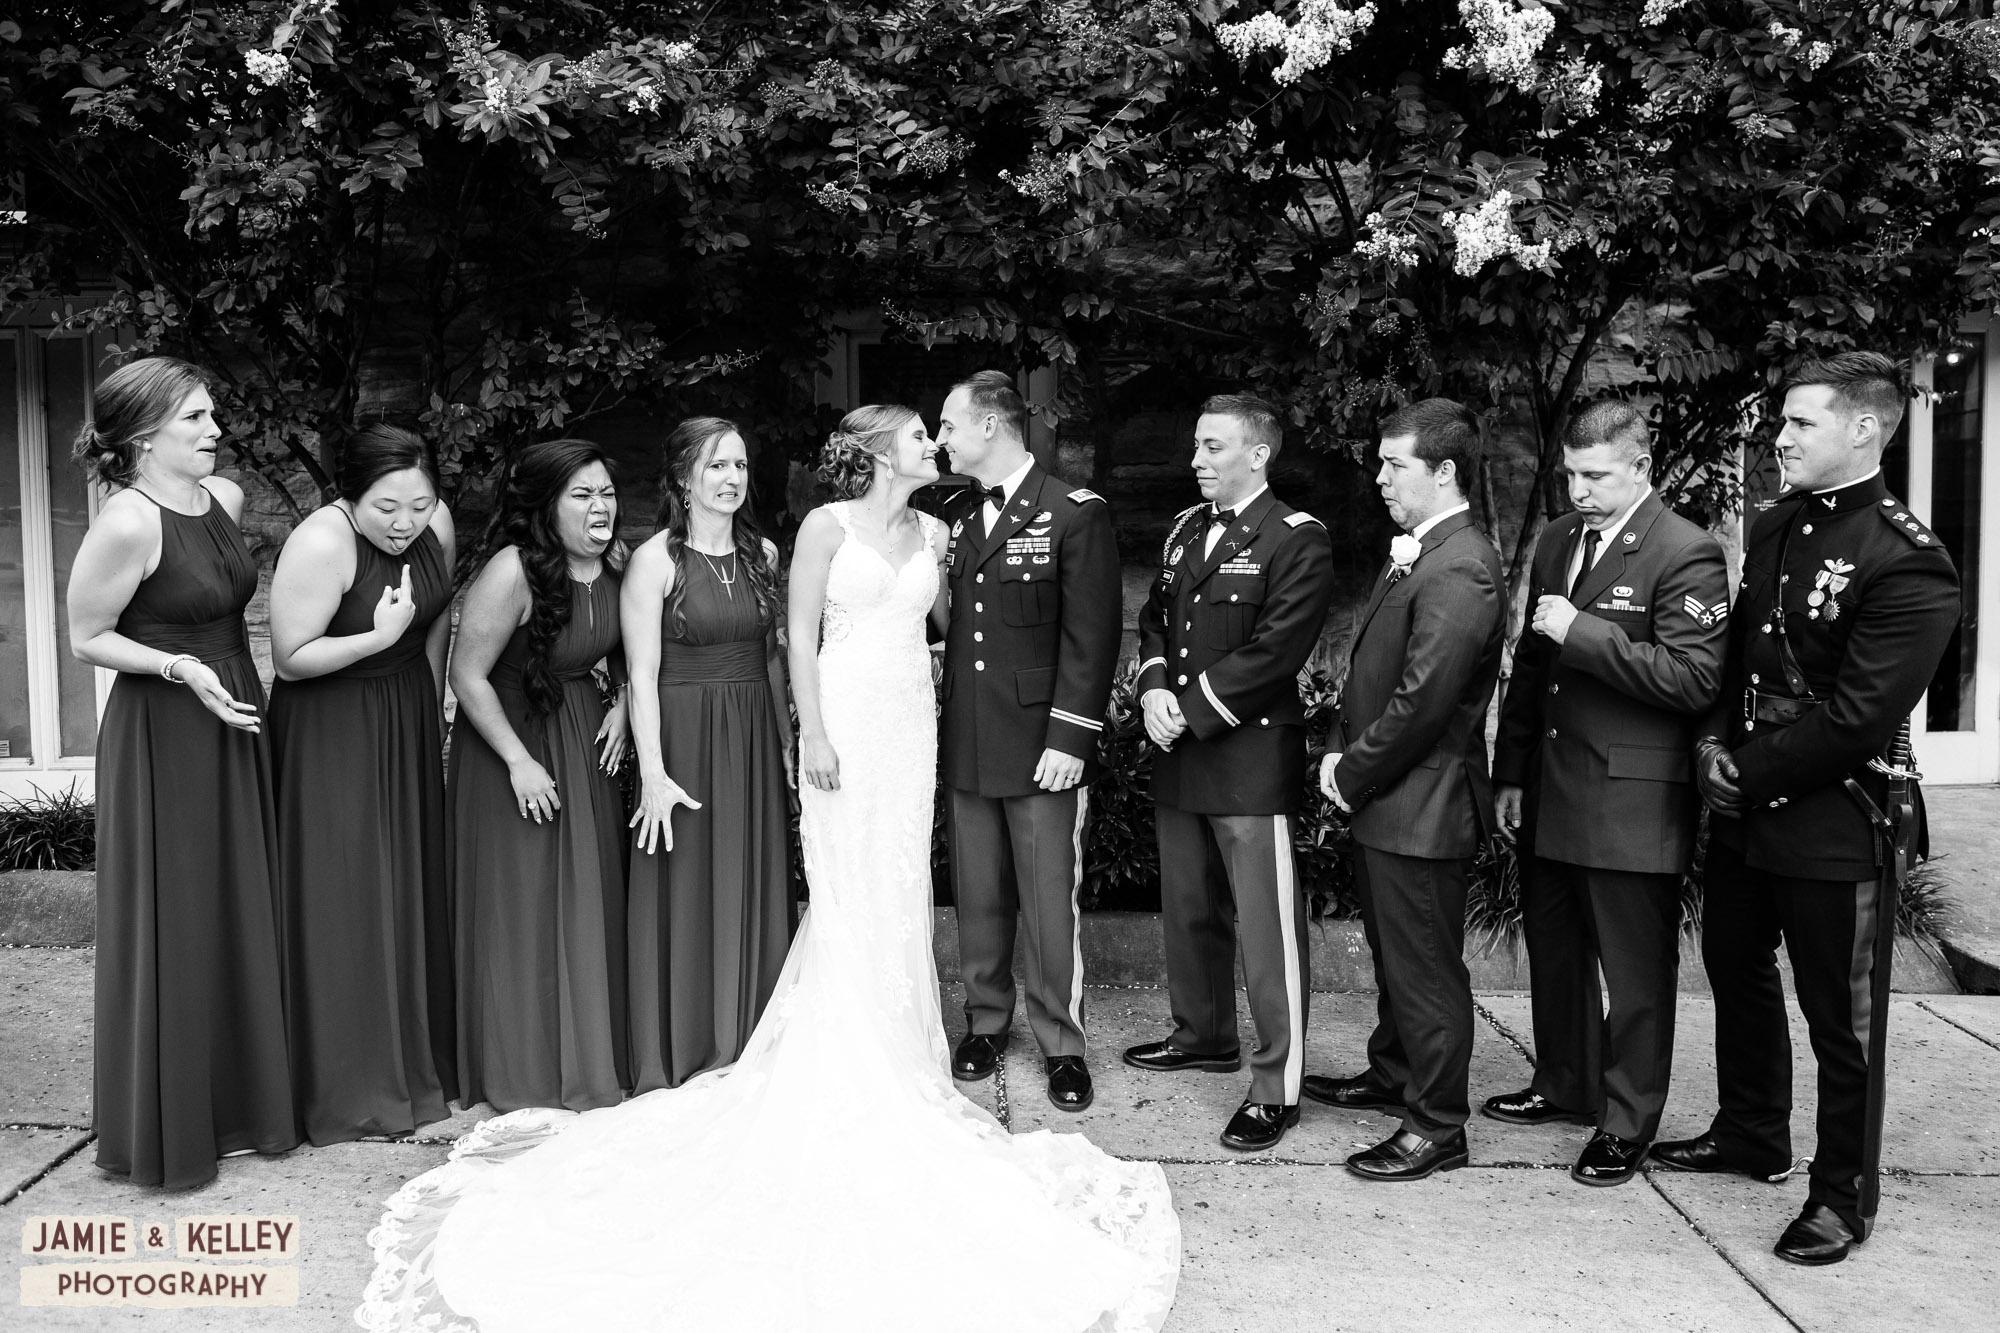 17_LindsayAndJohn_WeddingTeasers.jpg